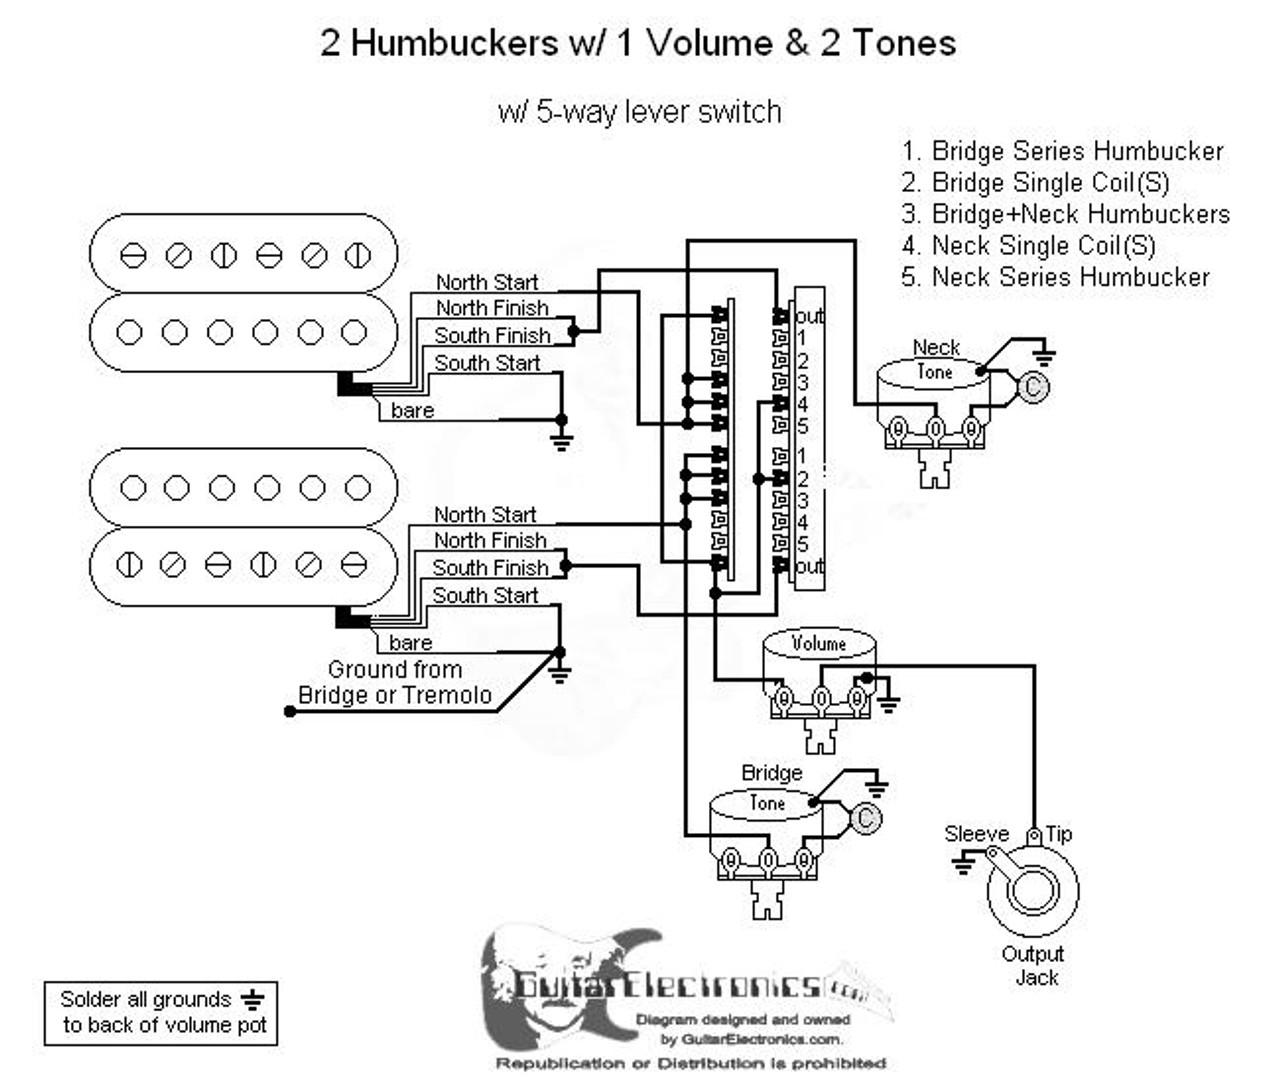 2 humbuckers 5 way lever switch 1 volume 2 tones 02 Fender 5 Way Switch Wiring Diagram 2 Humbuckers Fender 5 Way Switch Wiring Diagram 2 Humbuckers #15